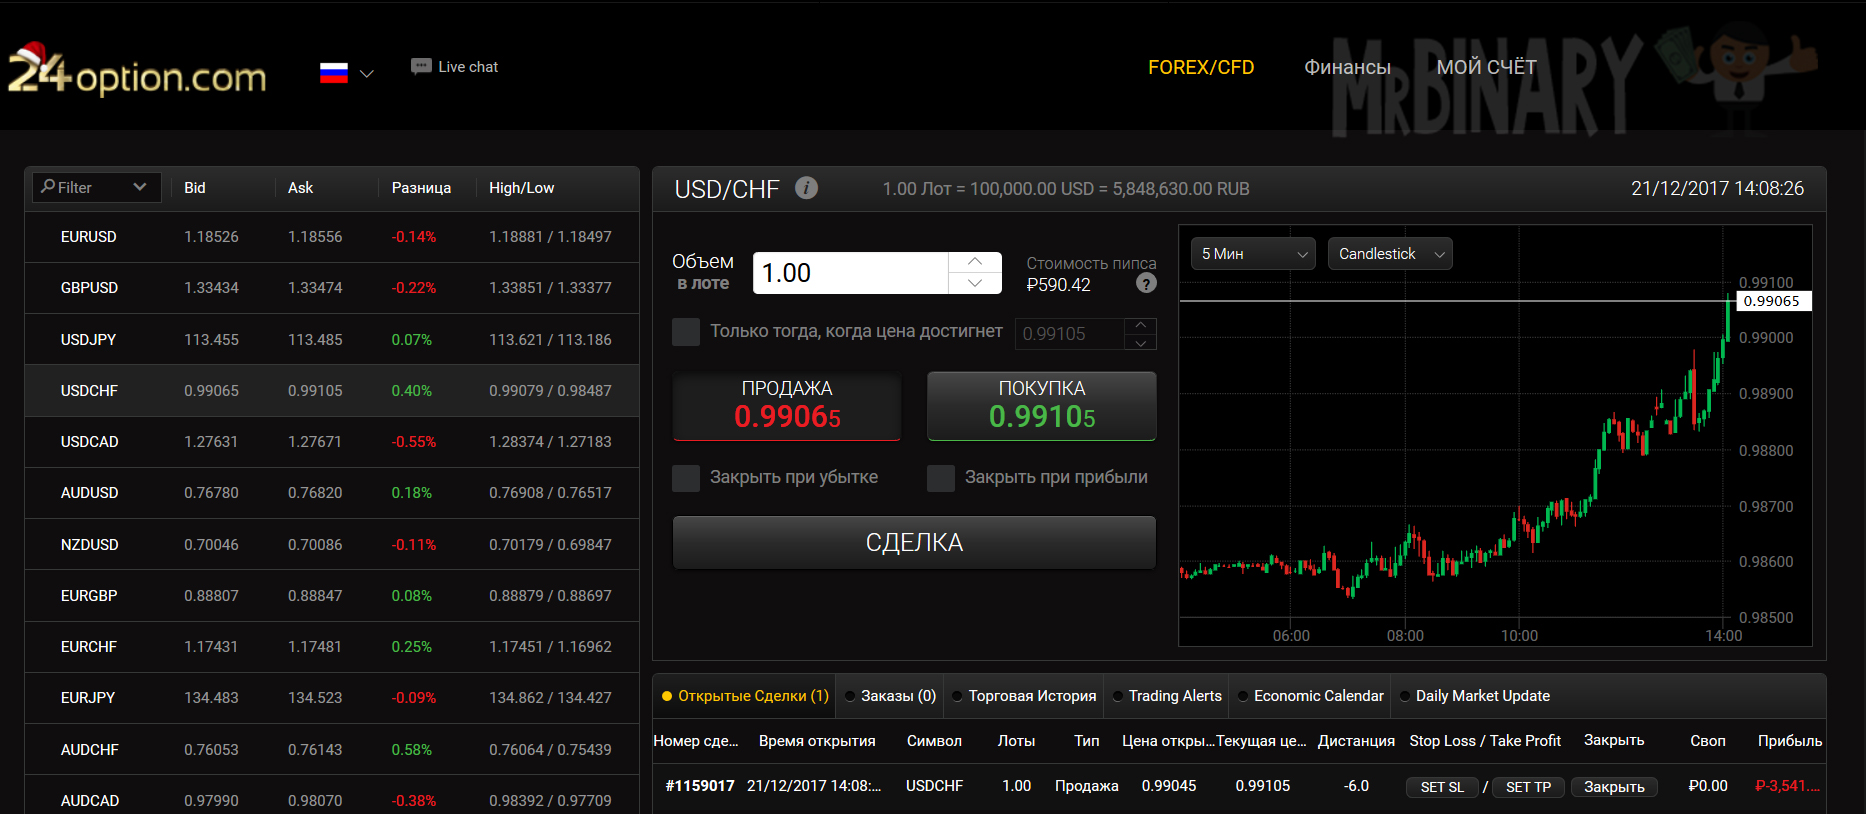 Best online stock broker yahoo answers